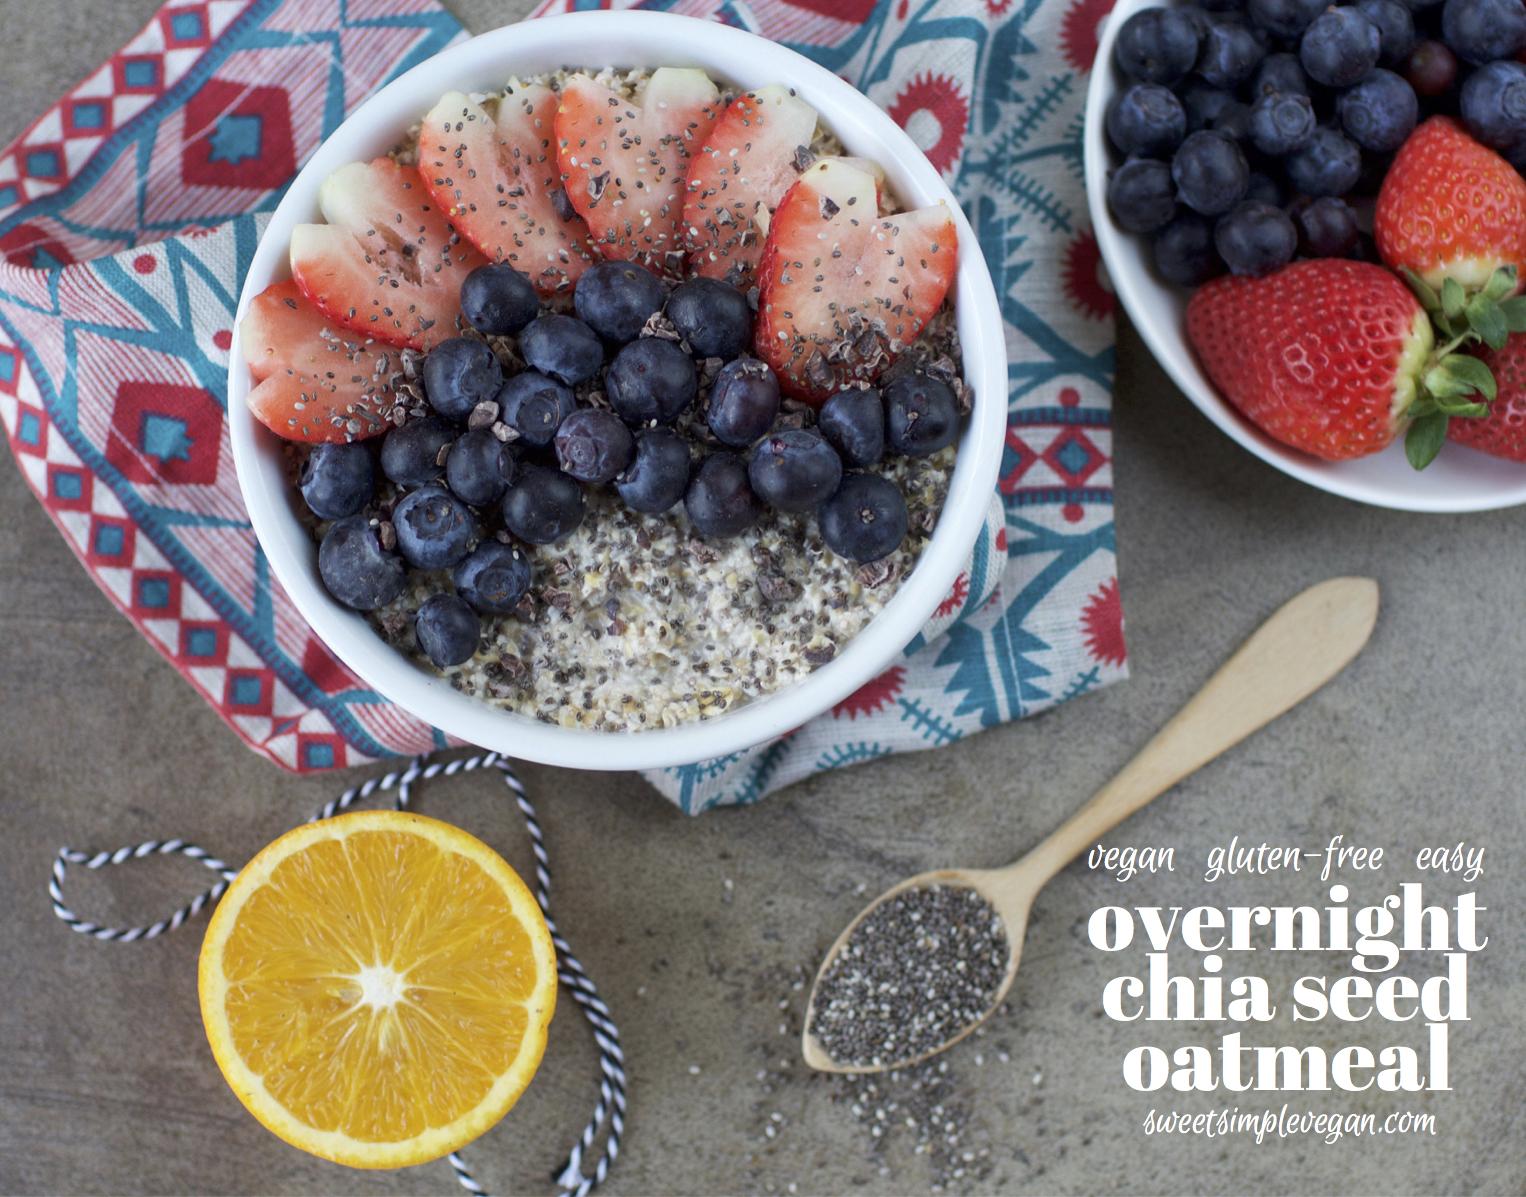 Easy Overnight Chia Oatmeal {gluten-free} sweetsimplevegan.com